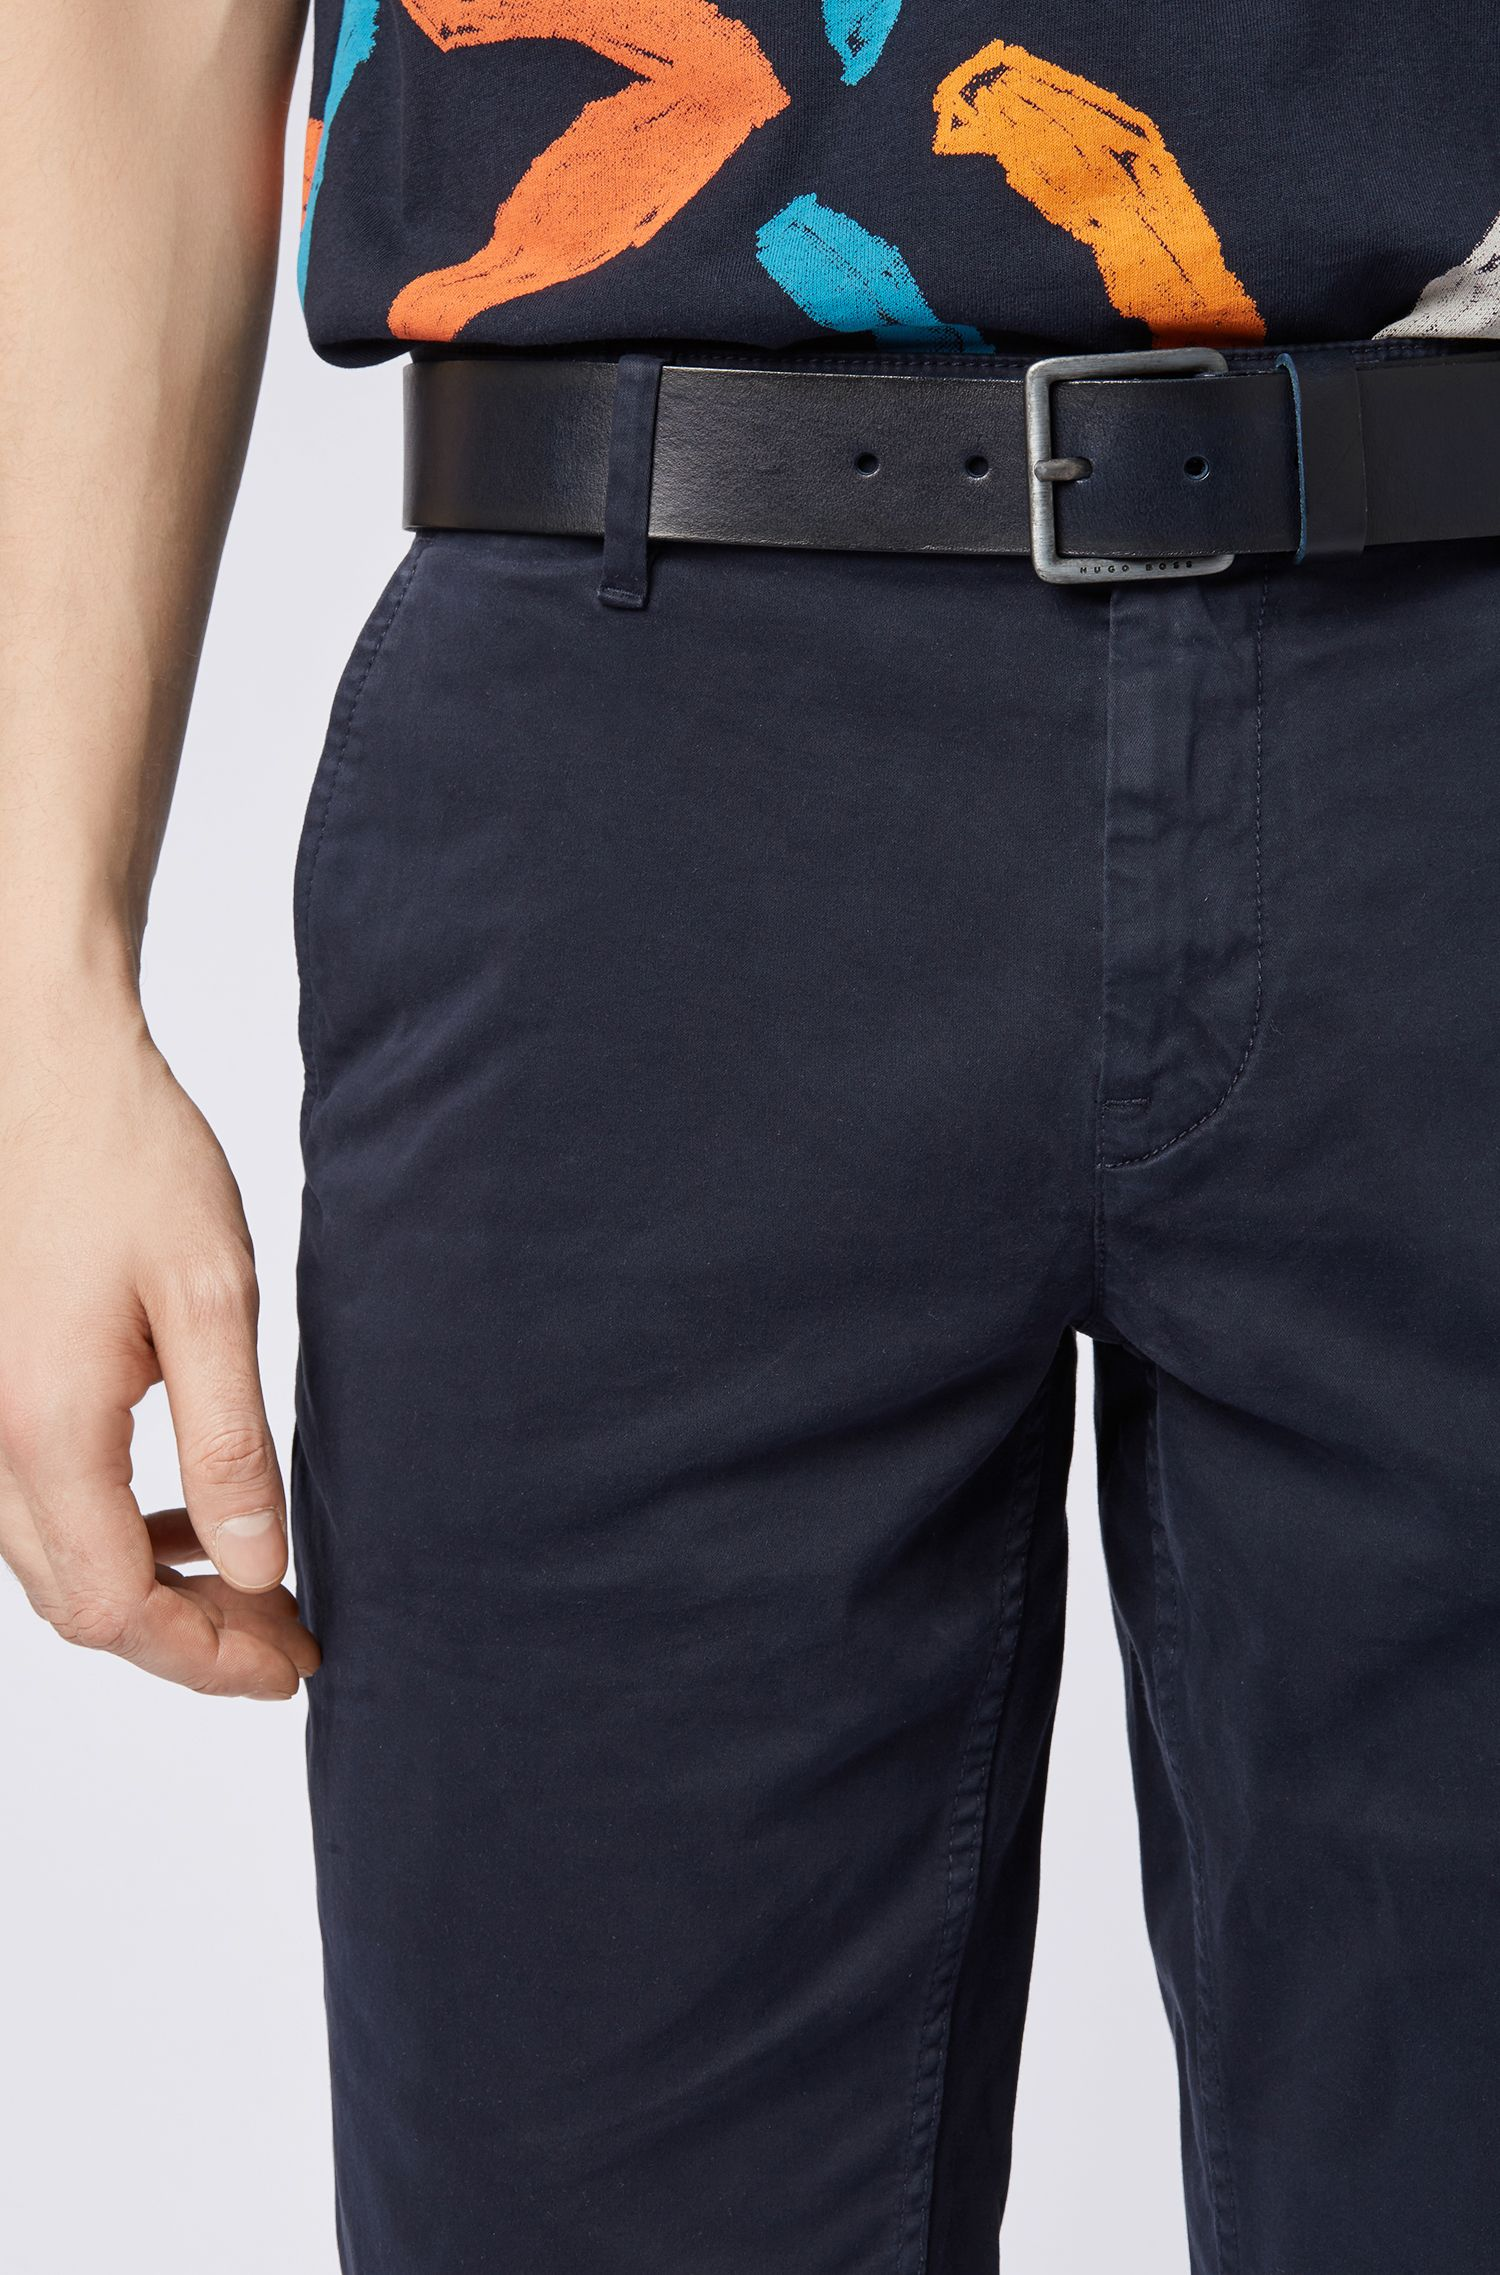 Cintura in pelle con impunture caratteristiche, Blu scuro